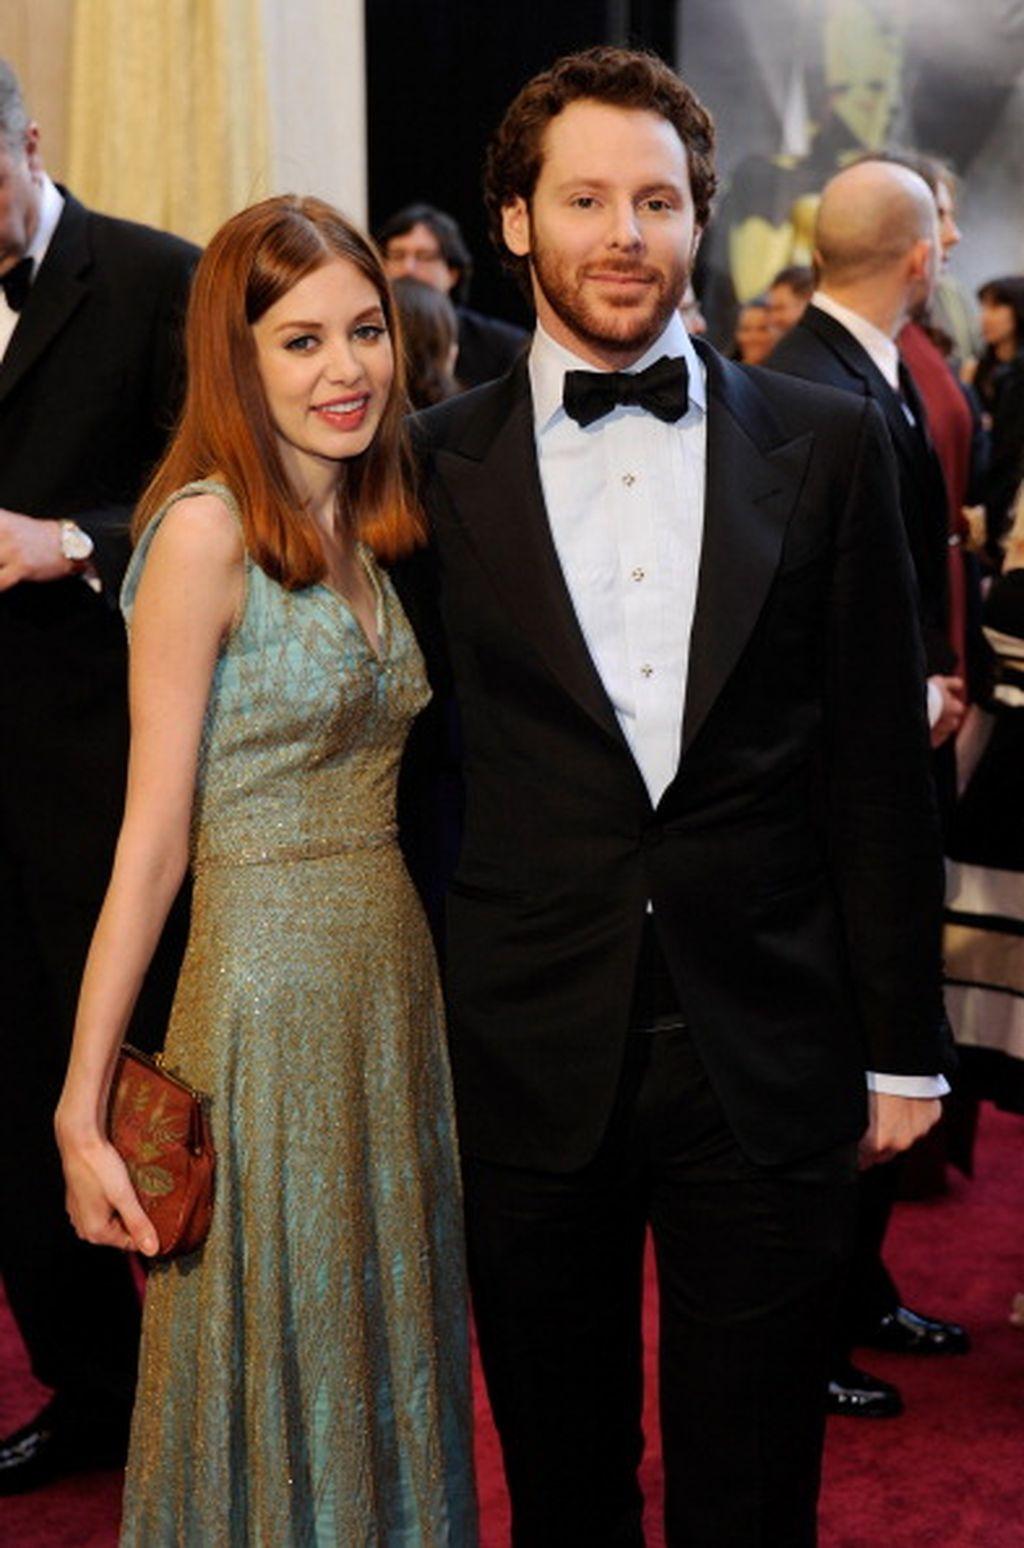 Sean Parker bersama istrinya Alexandra Lenas, seorang penyanyi dan penulis lagu. Foto: Getty Images